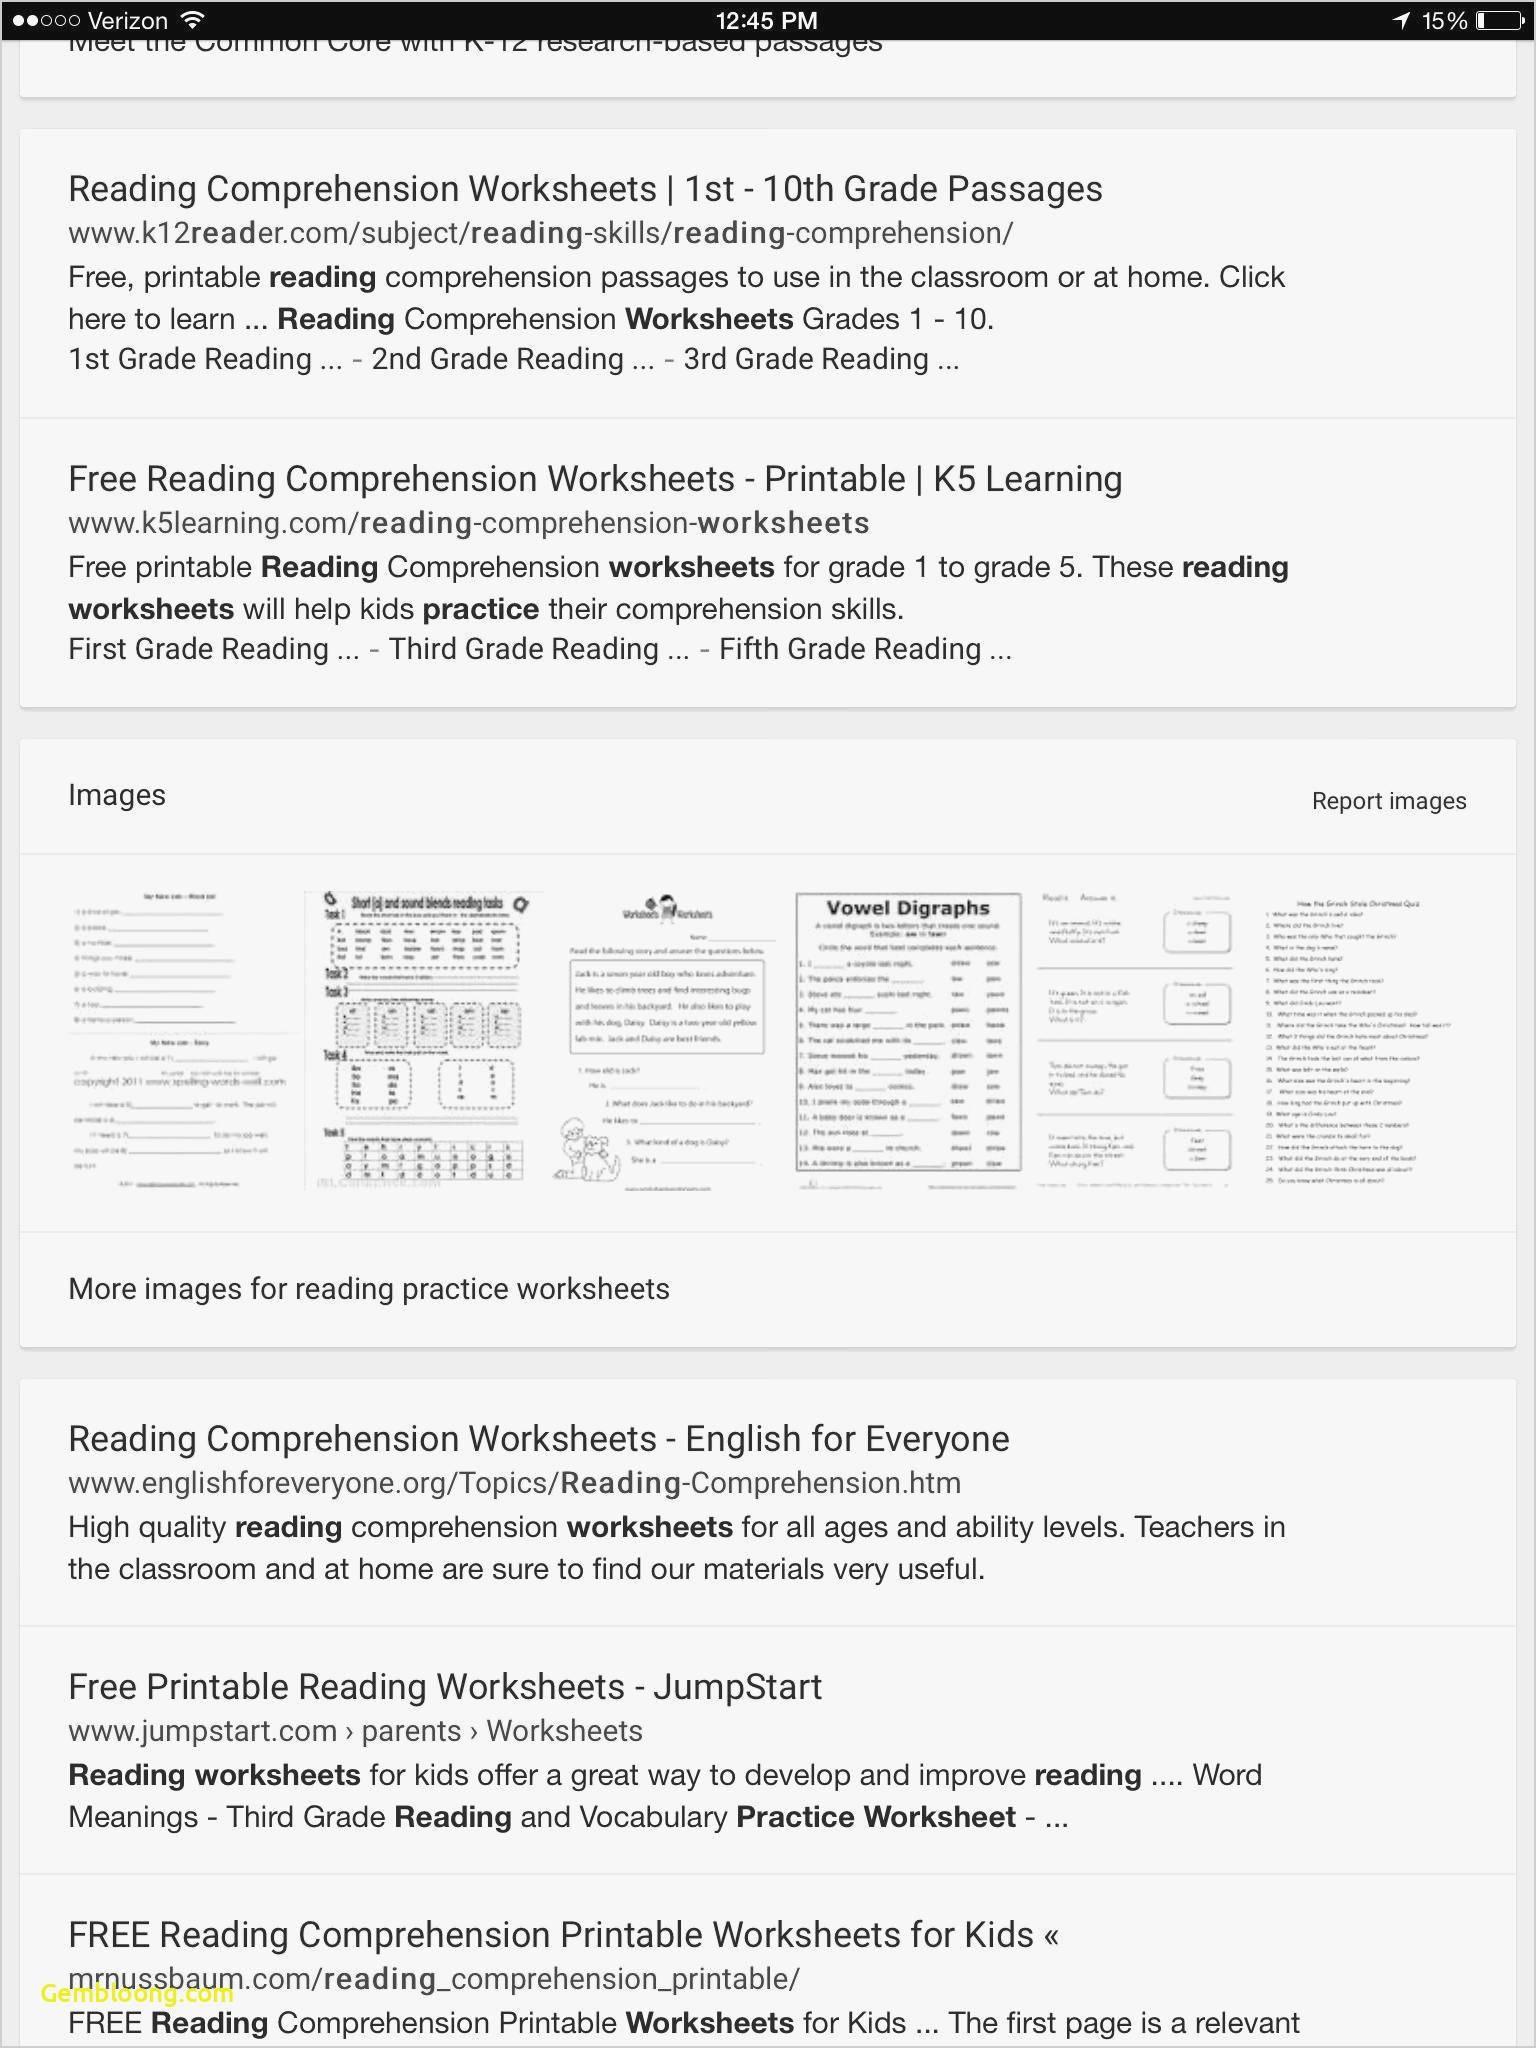 Reading Comprehension Worksheets For 1St Grade - Cramerforcongress - Free Printable Reading Worksheets For 5Th Grade